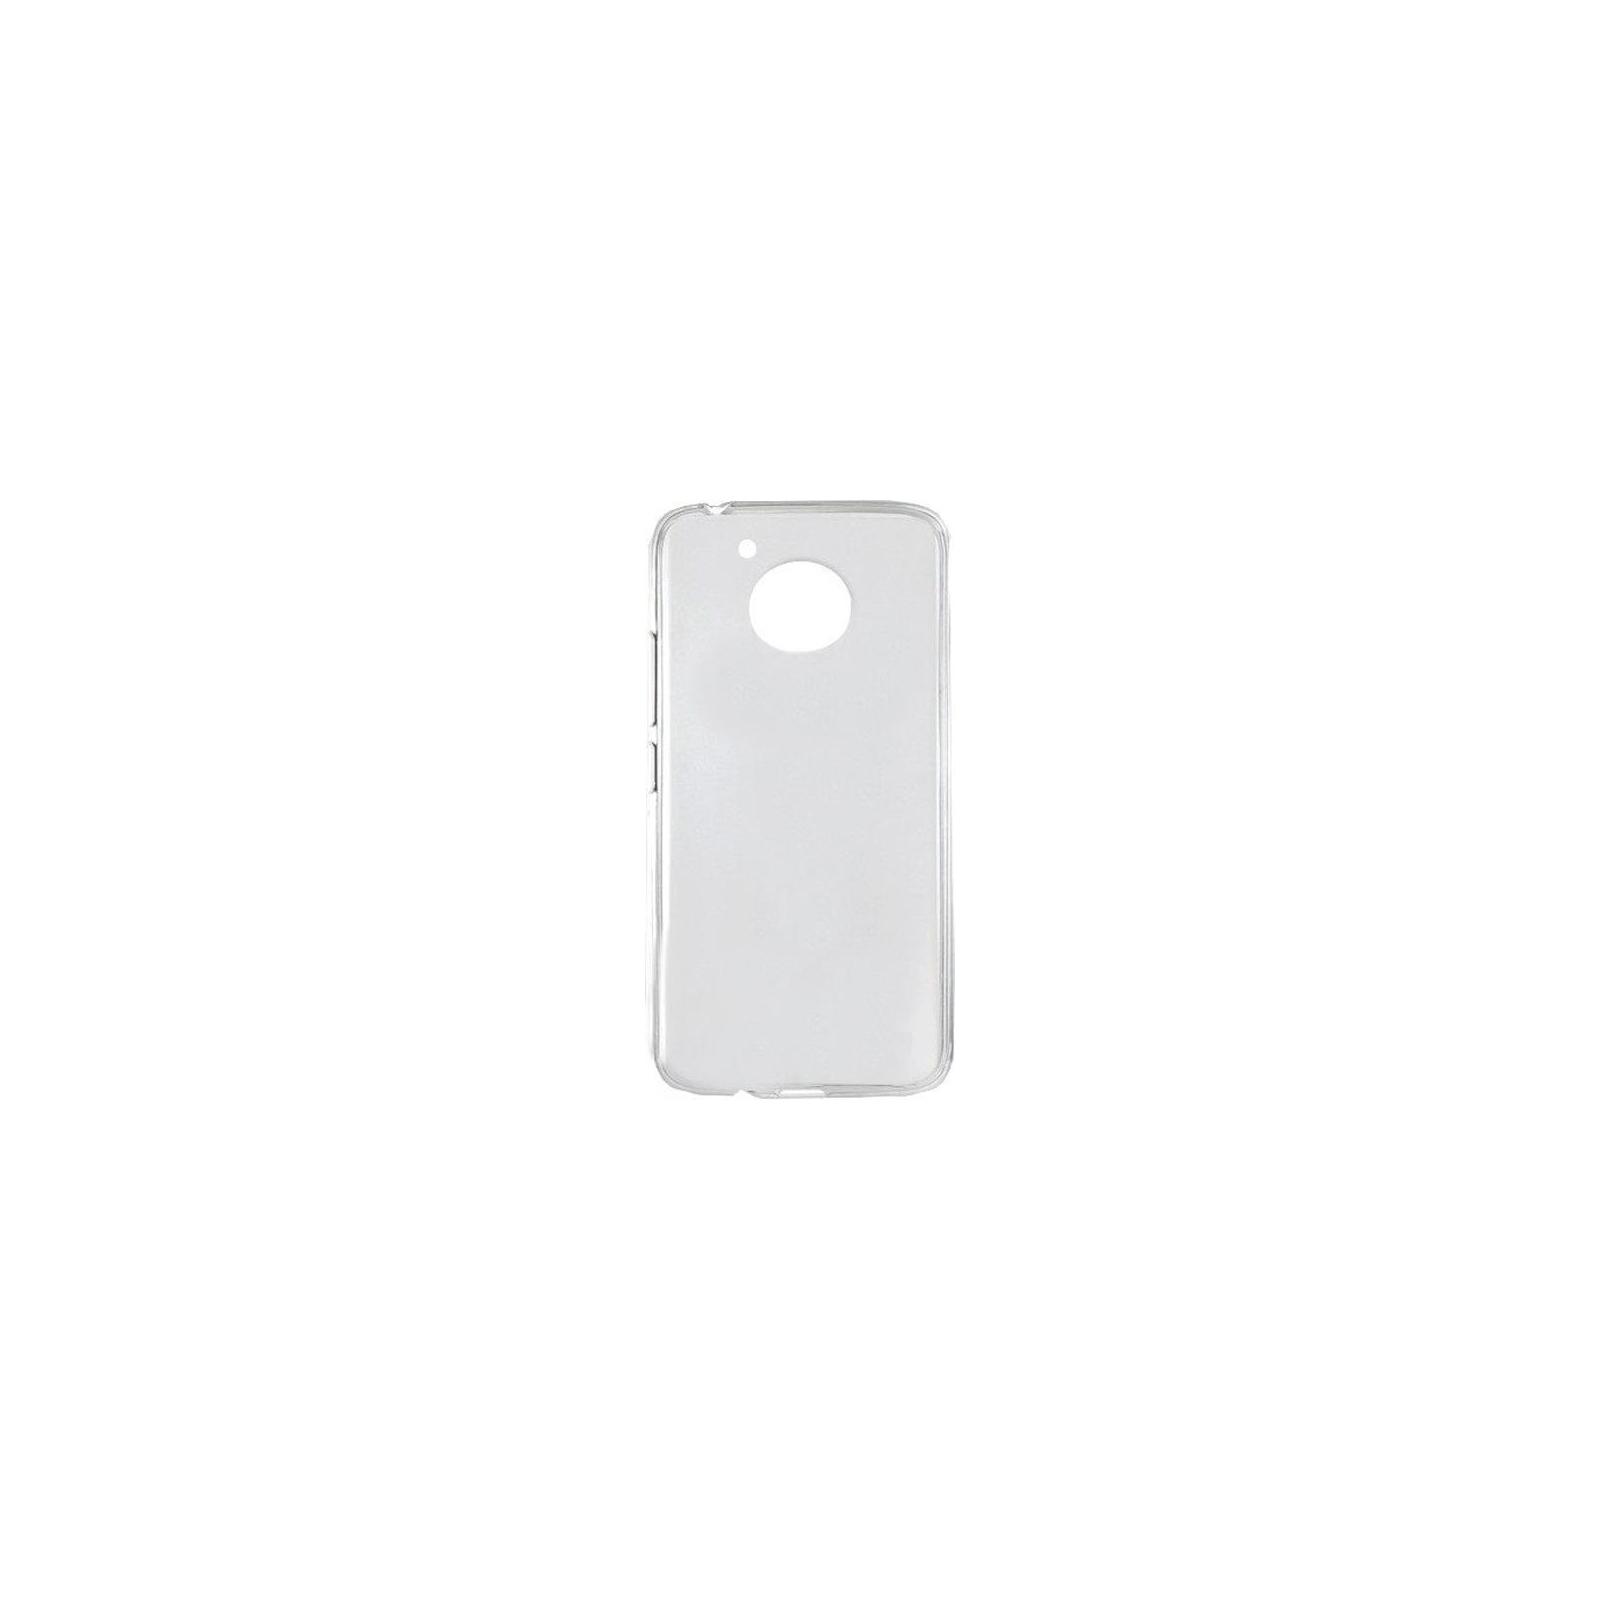 Чехол для моб. телефона Colorway TPU case for Motorola MOTO E Plus (XT1771) (CW-CTBMMEP)